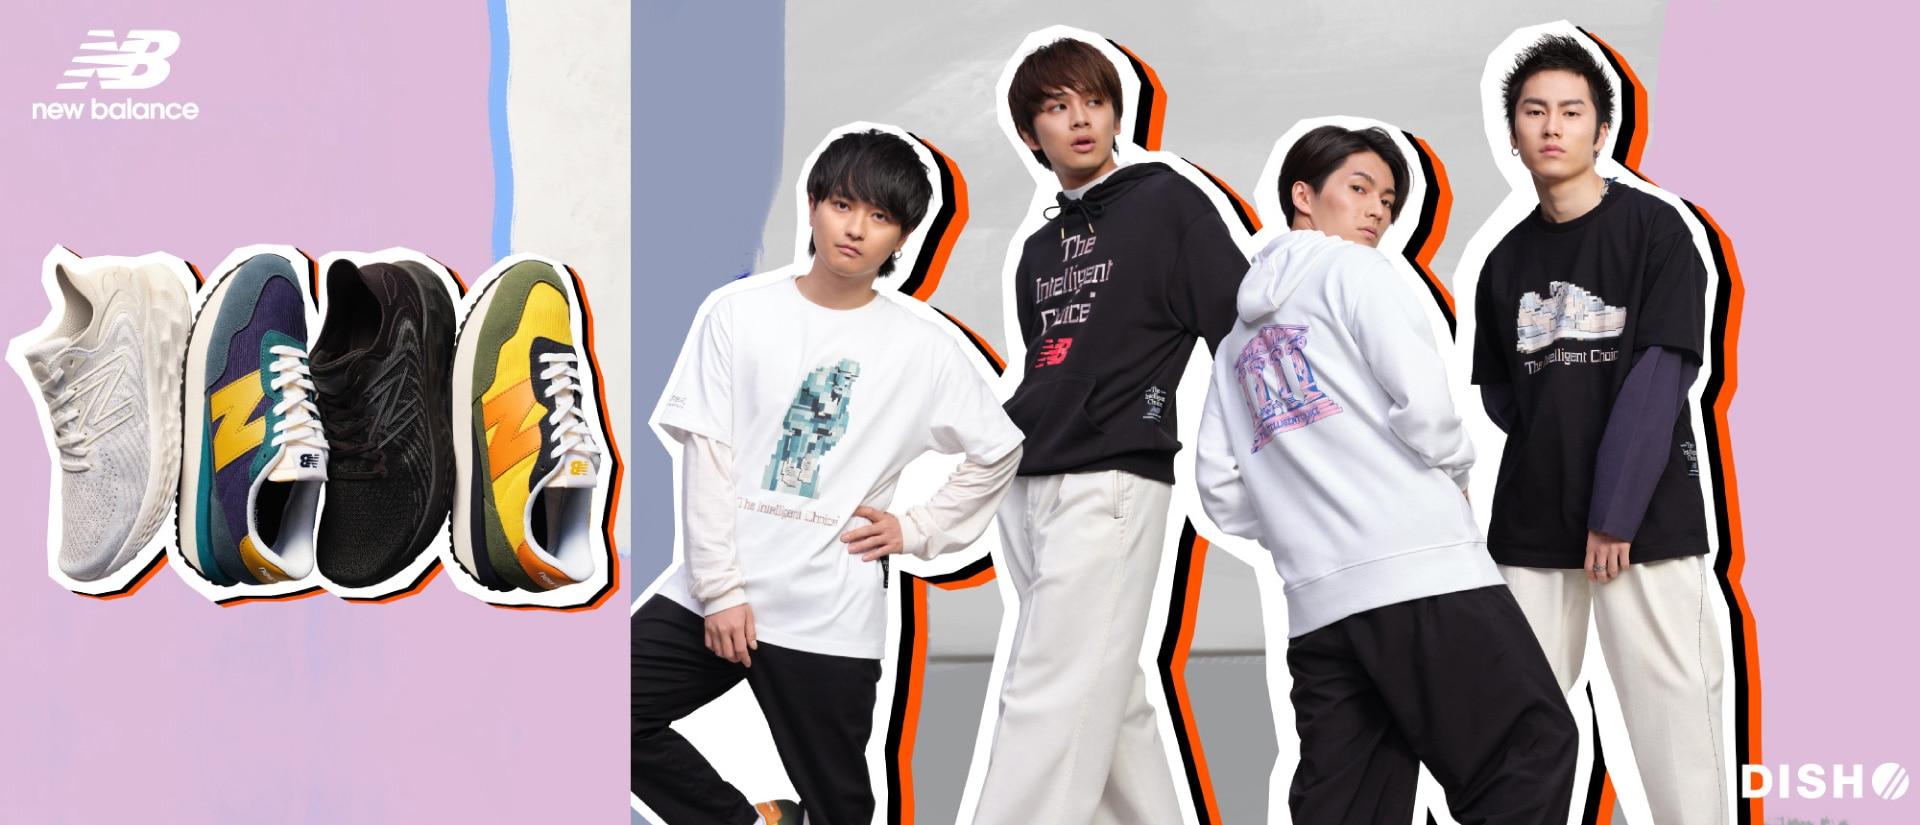 New Balance × DISH//